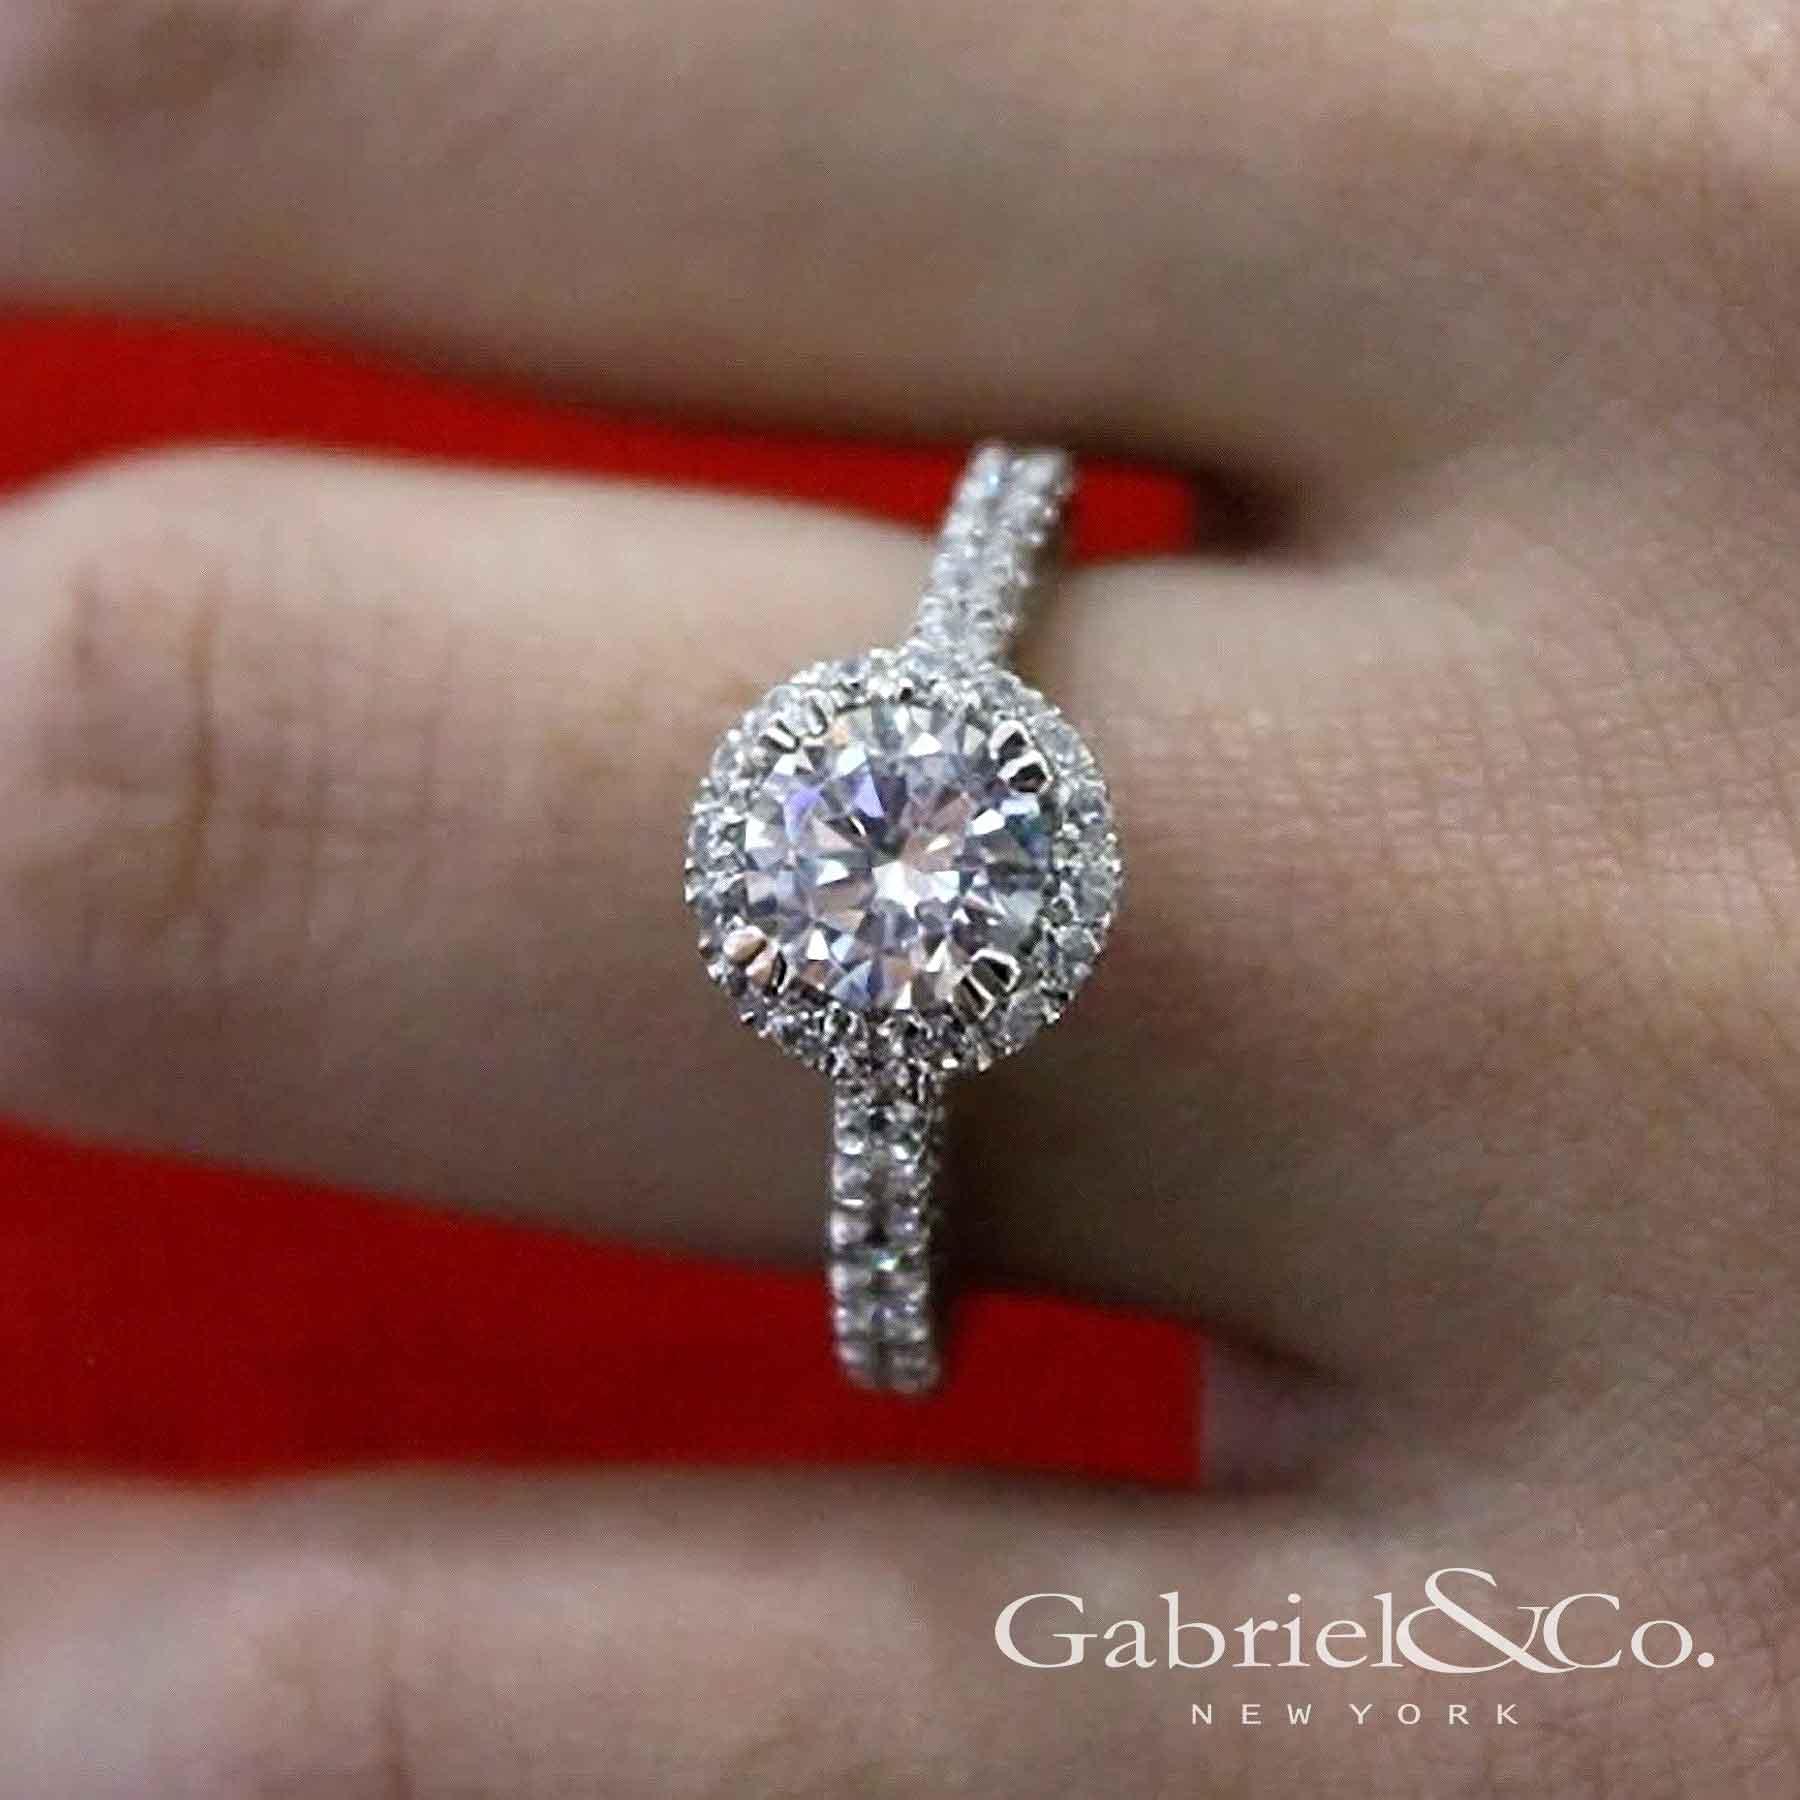 gabriel engagement ring.jpg